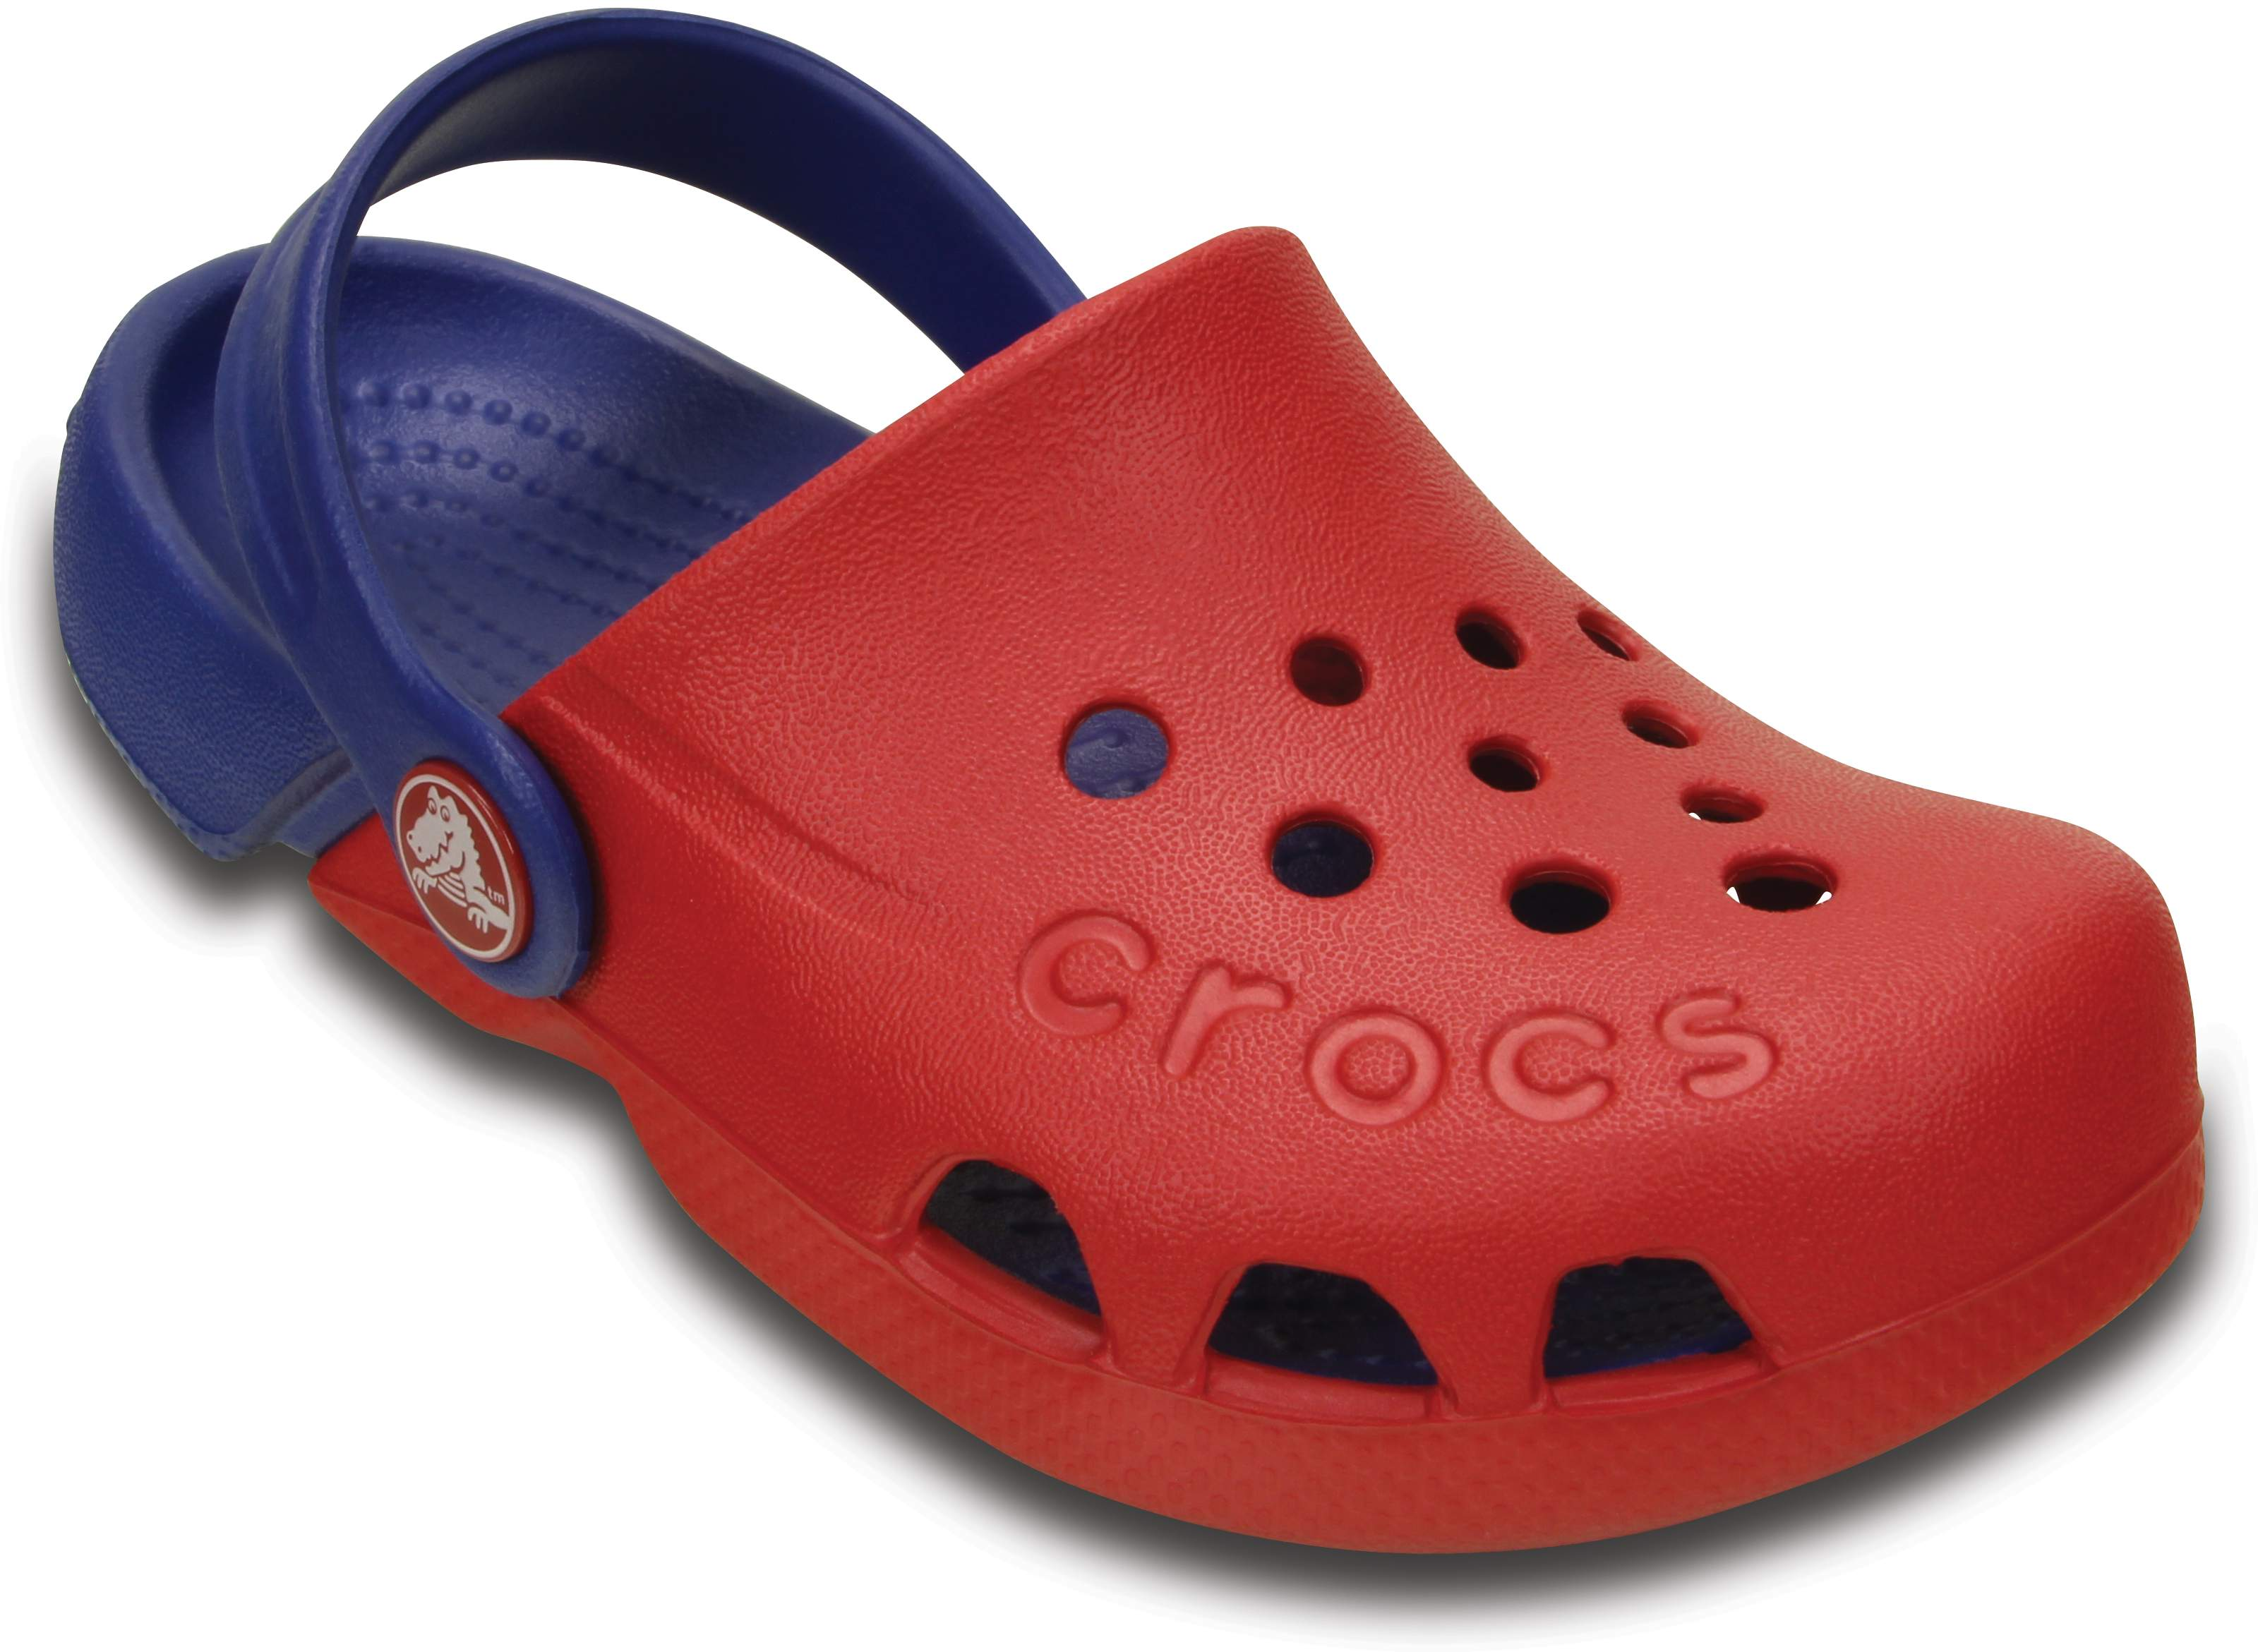 Crocs Sabots Electro Kids 10400 6A0